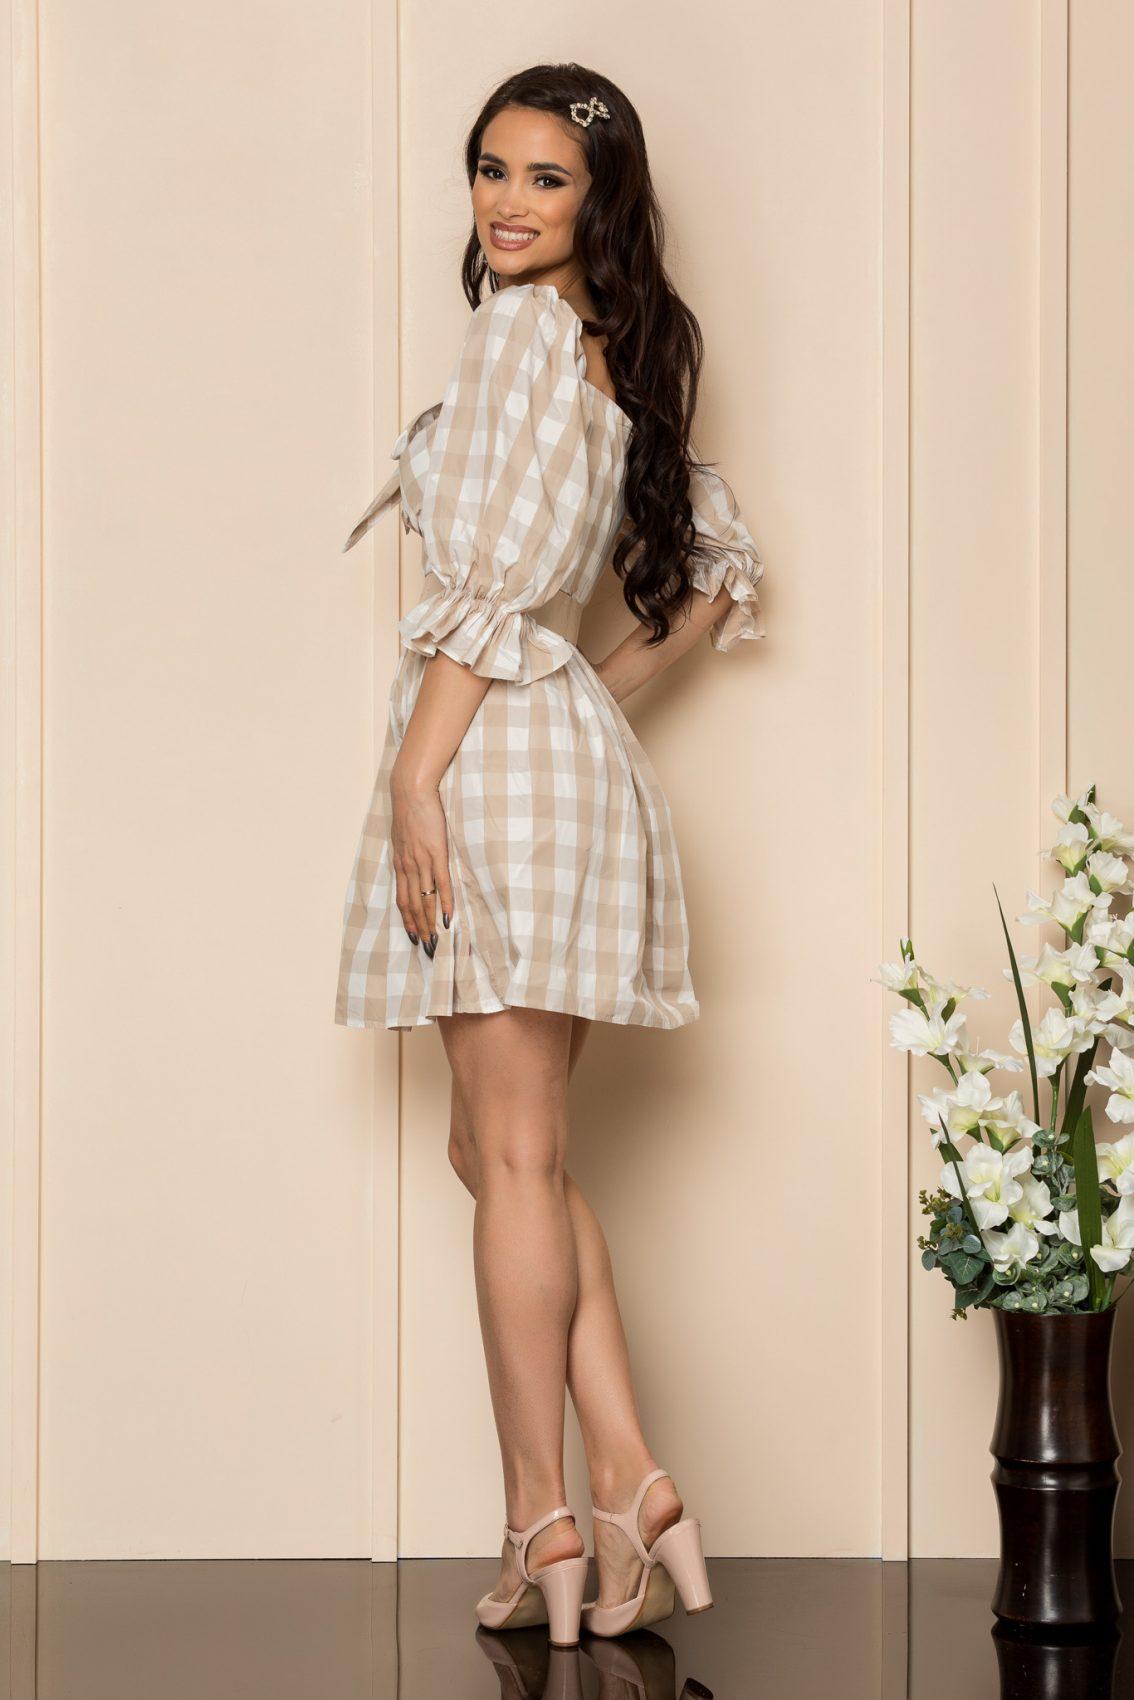 Nude Καρό Φόρεμα Mavis A430 2